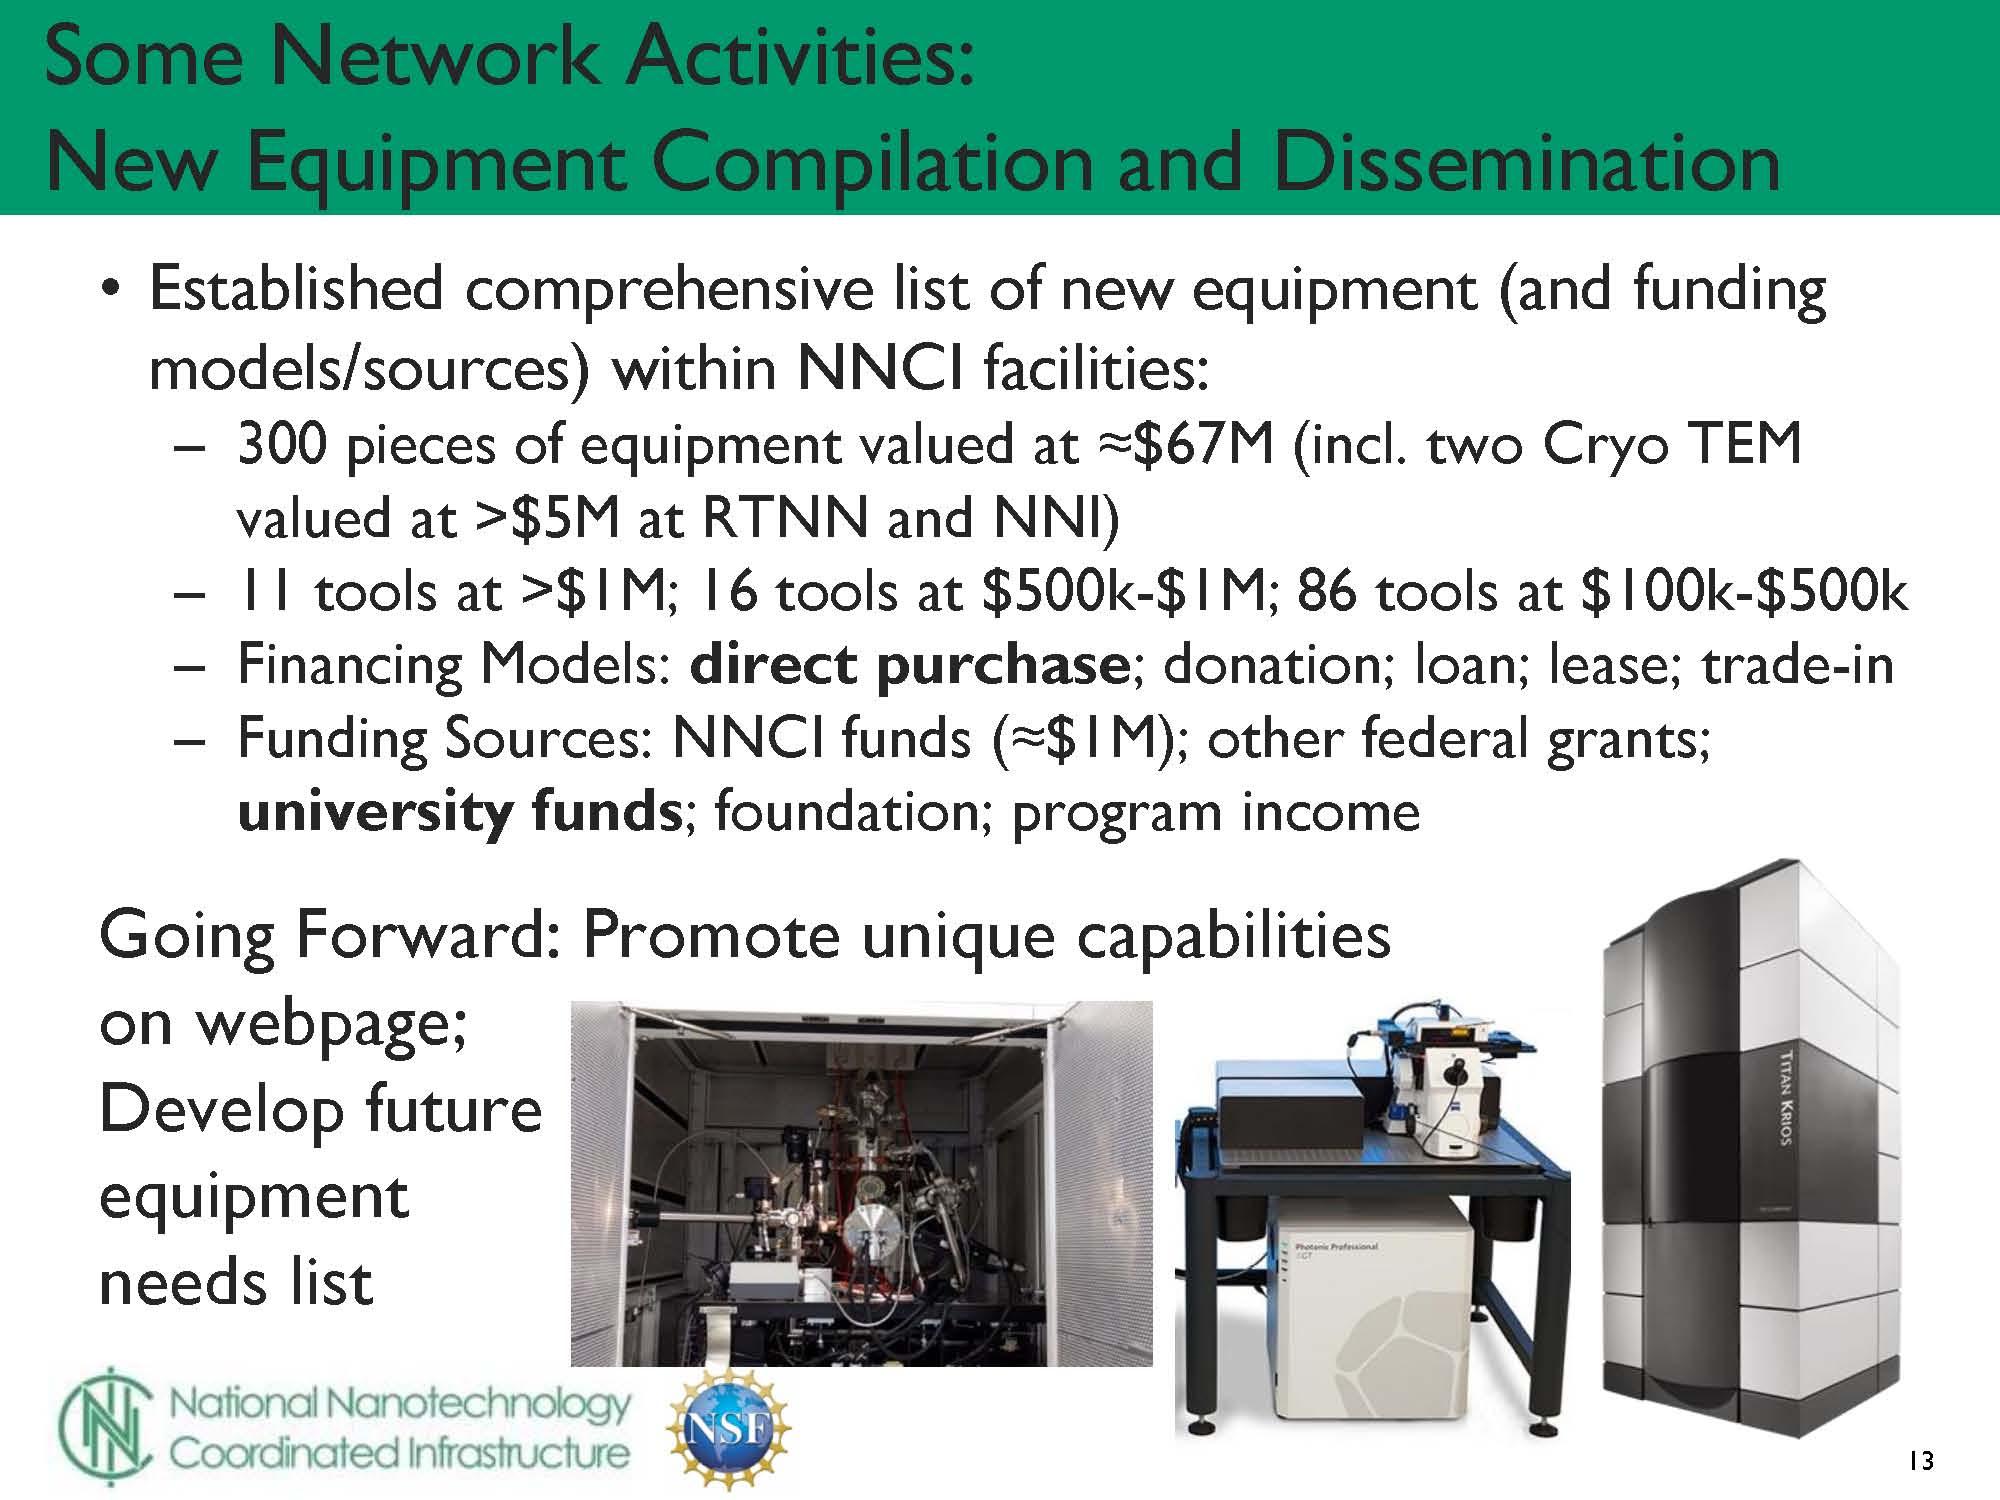 NSF 2017 NanoscienceGrantees Conf - NNCI presentation by Mark Allen_Page_13.jpg